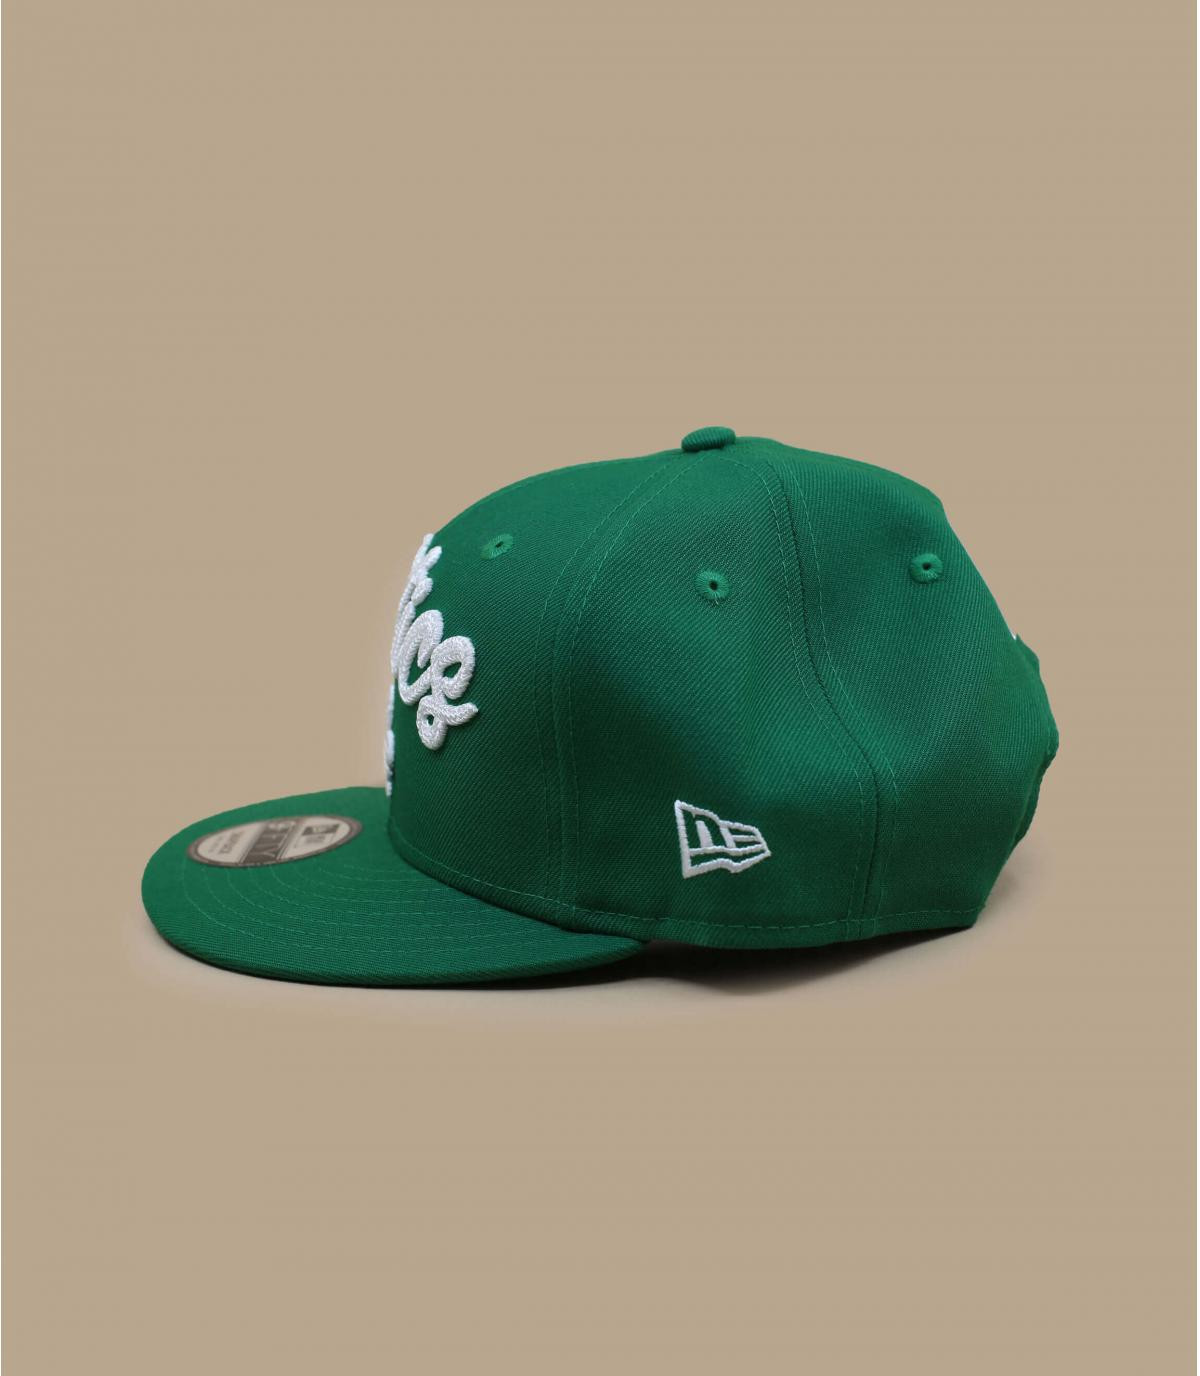 Détails Snapback NBA Draft Celtics 950 - image 3